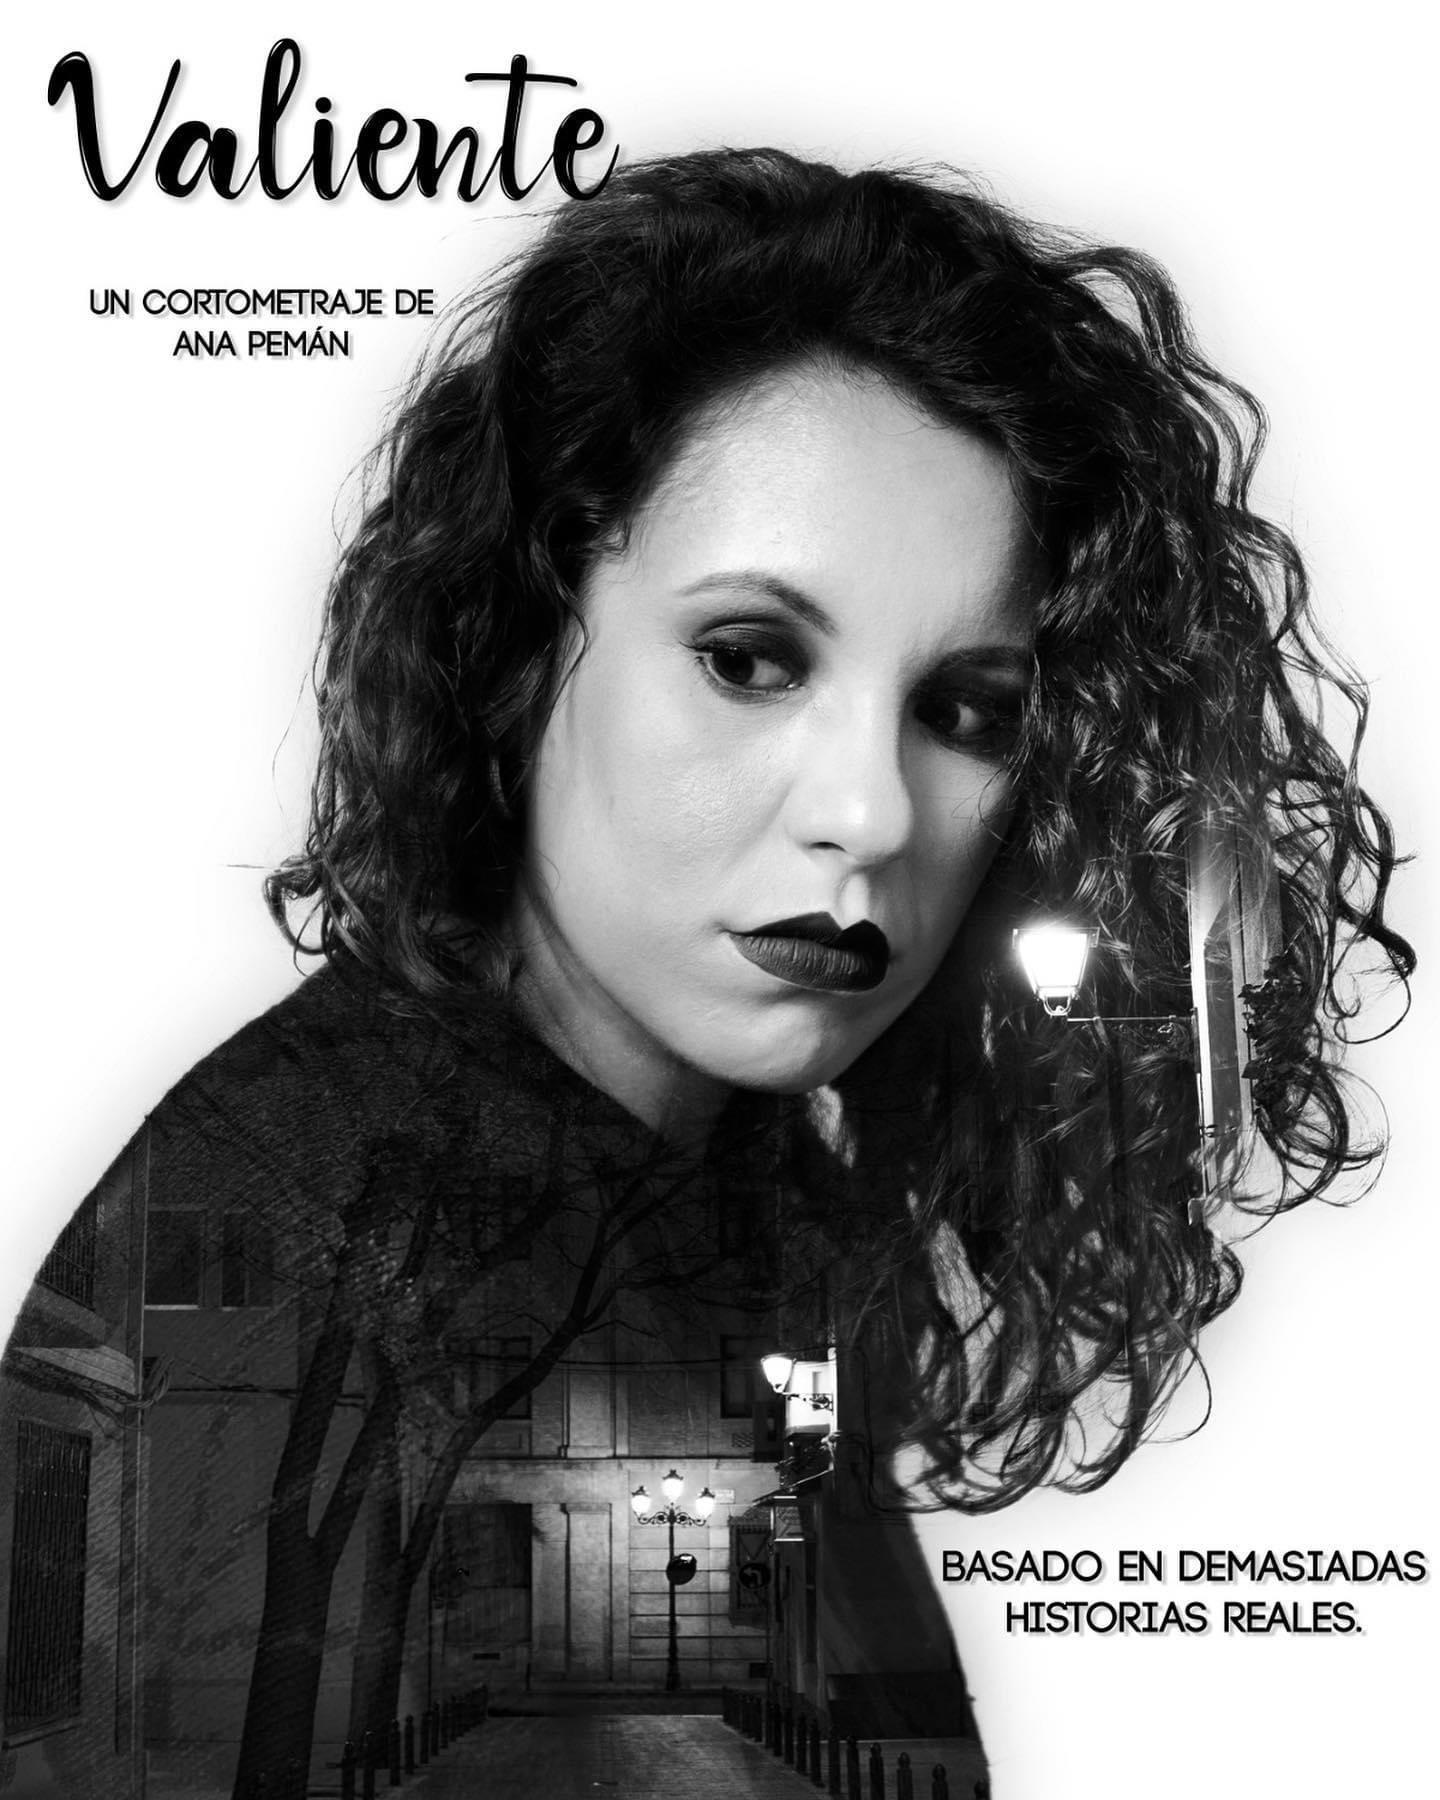 Valiente_AnaPeman_cartel